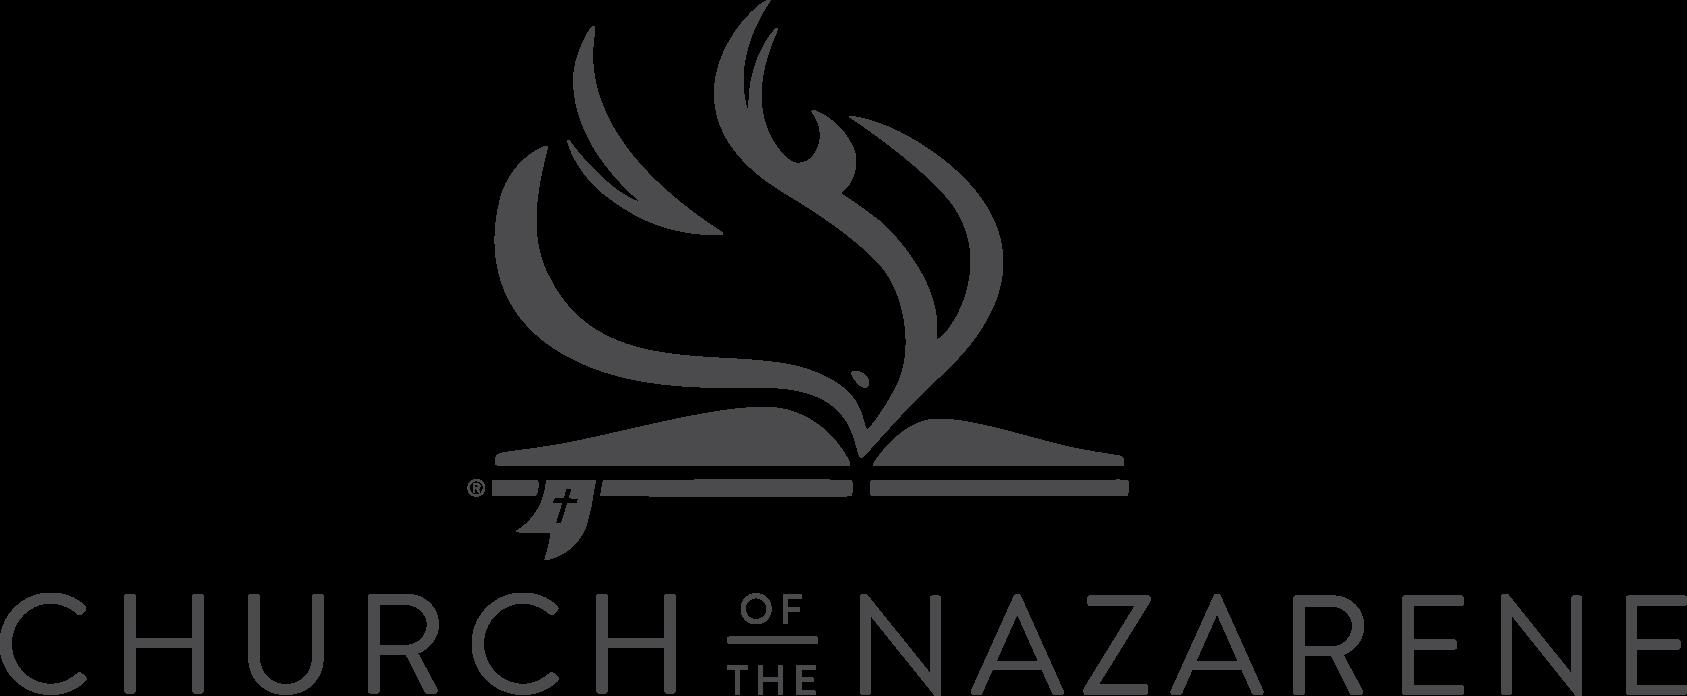 picture freeuse download jesus svg logo nazarene #98356545